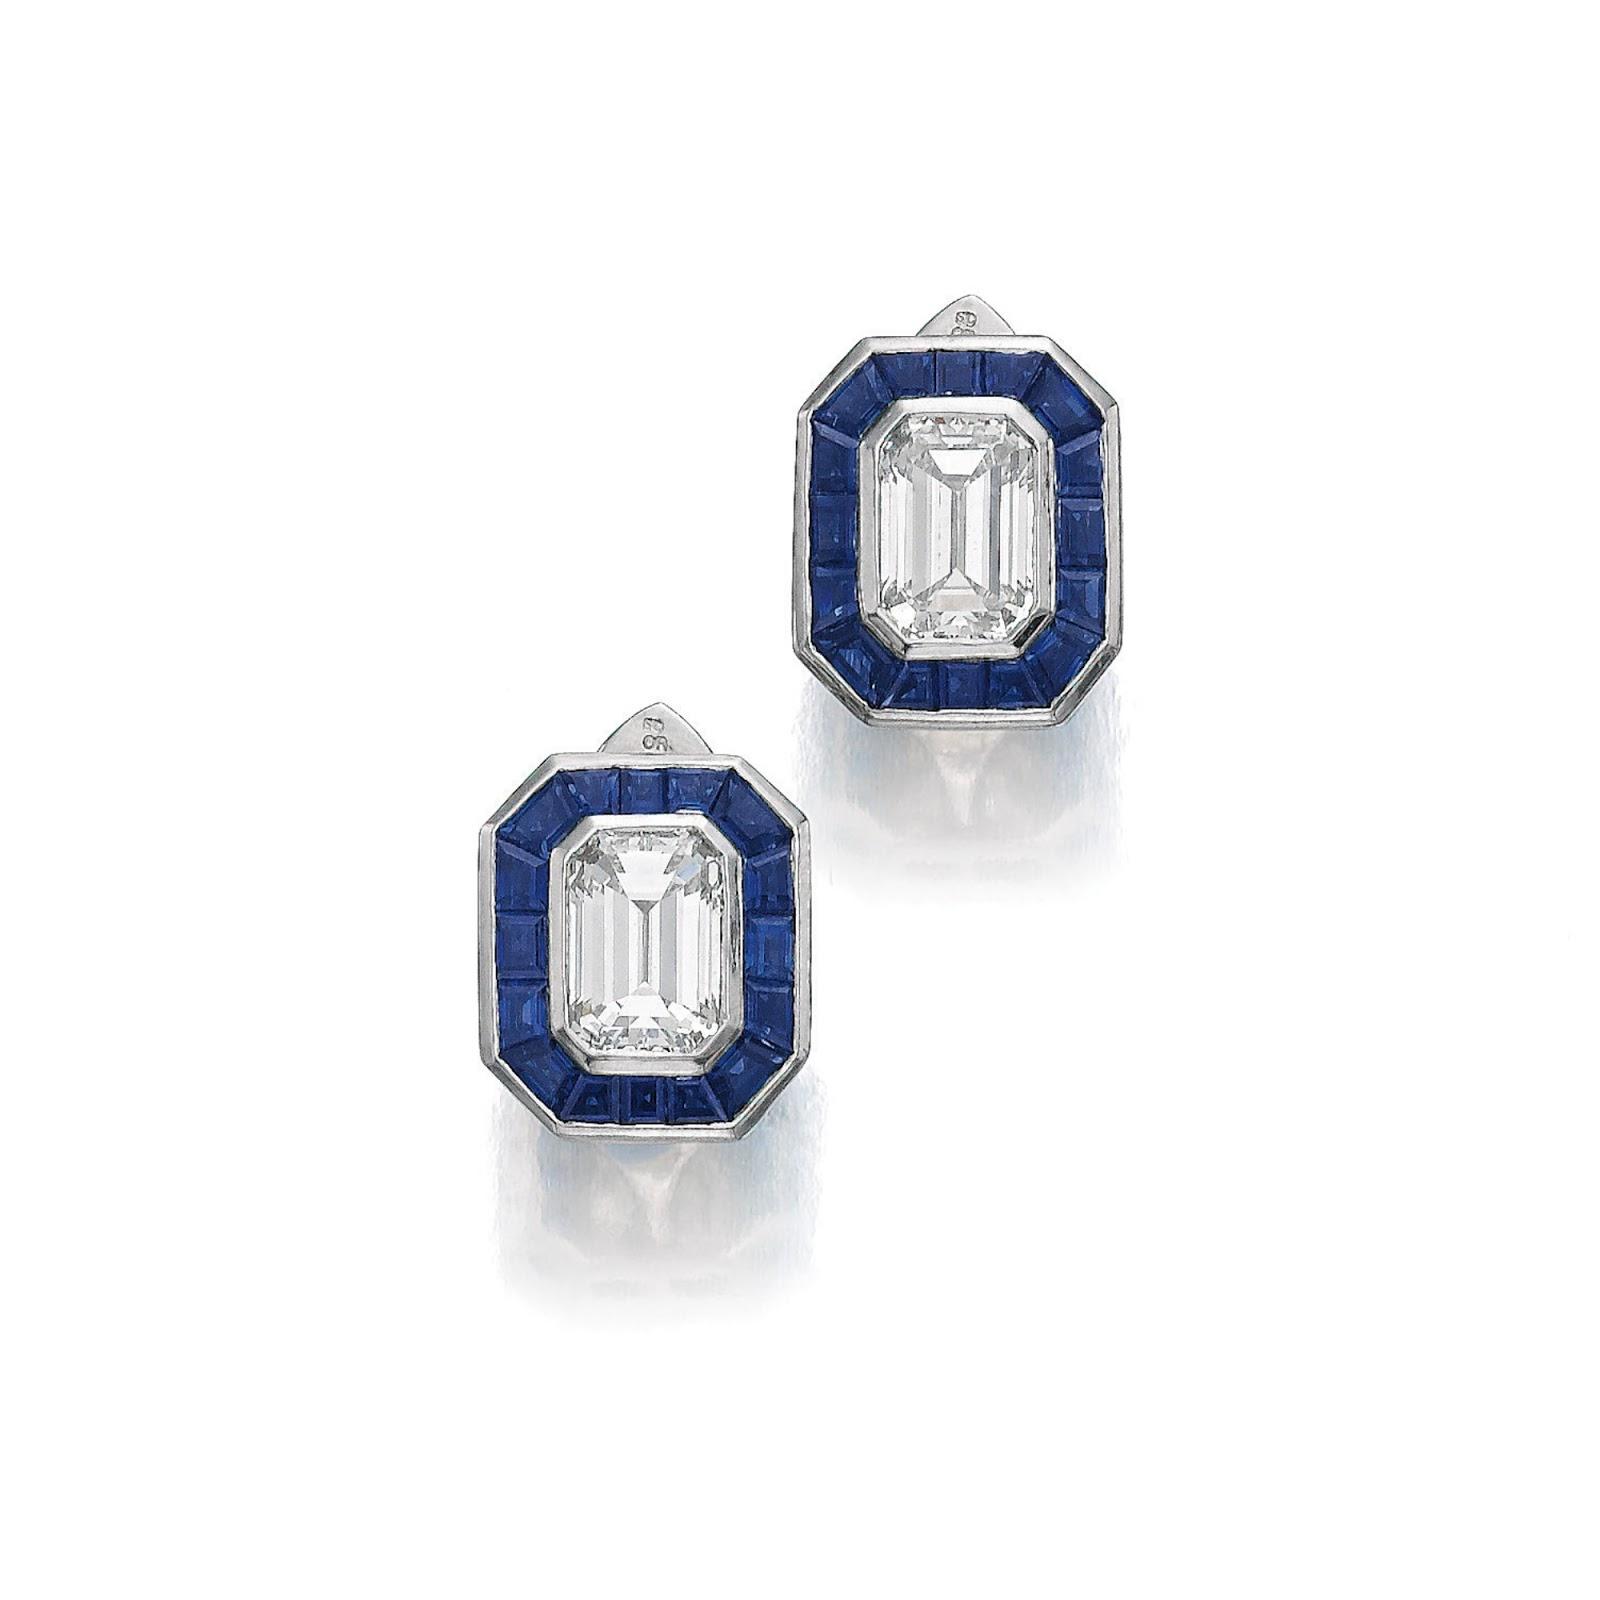 A Pair Of Calibrecut Sapphire And Emeraldcut Diamond Earrings